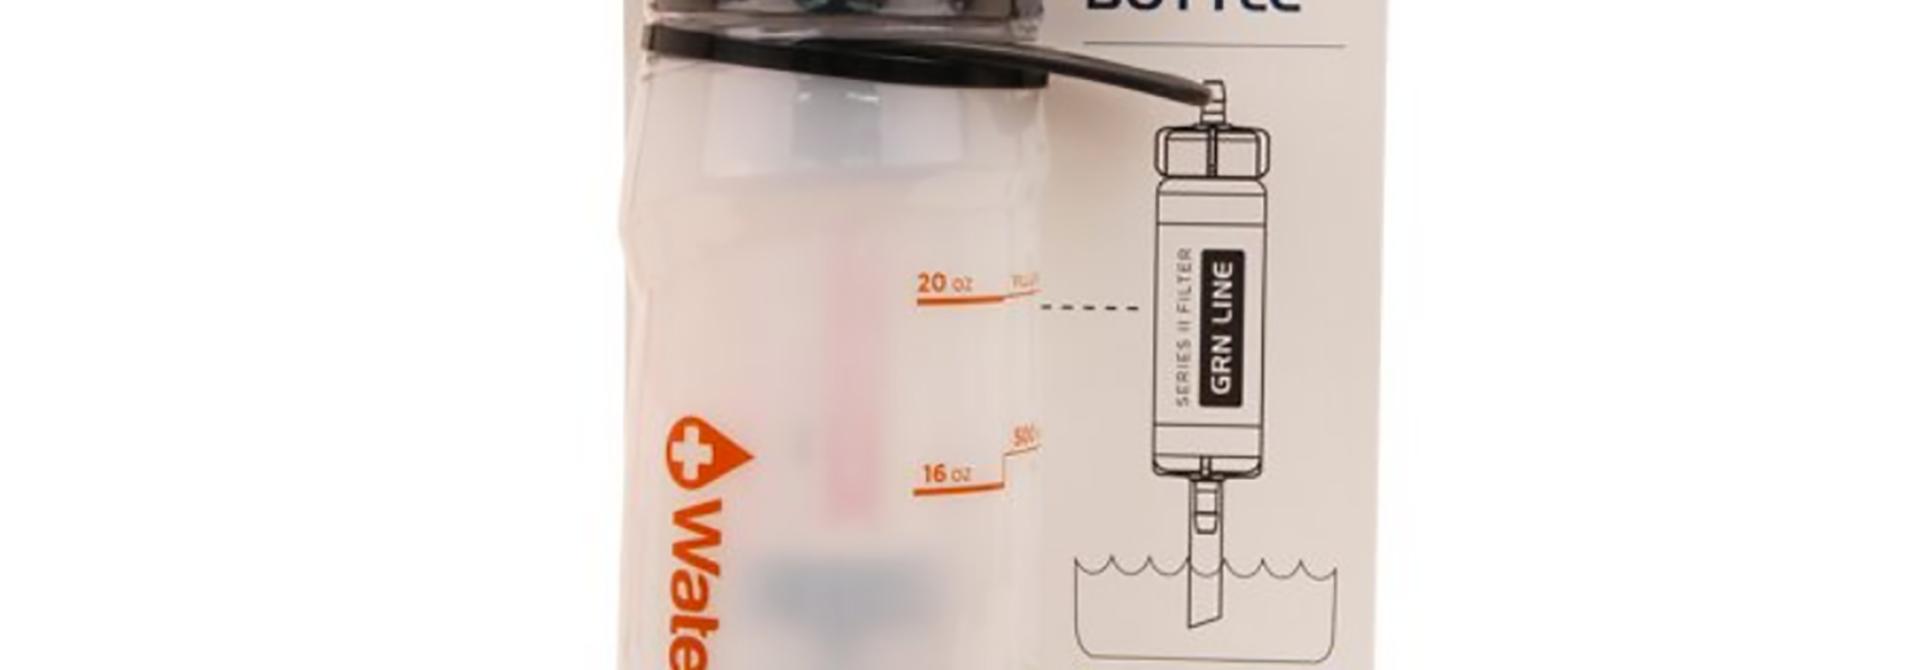 Waterbasics Filtered Water Bottle Green Line